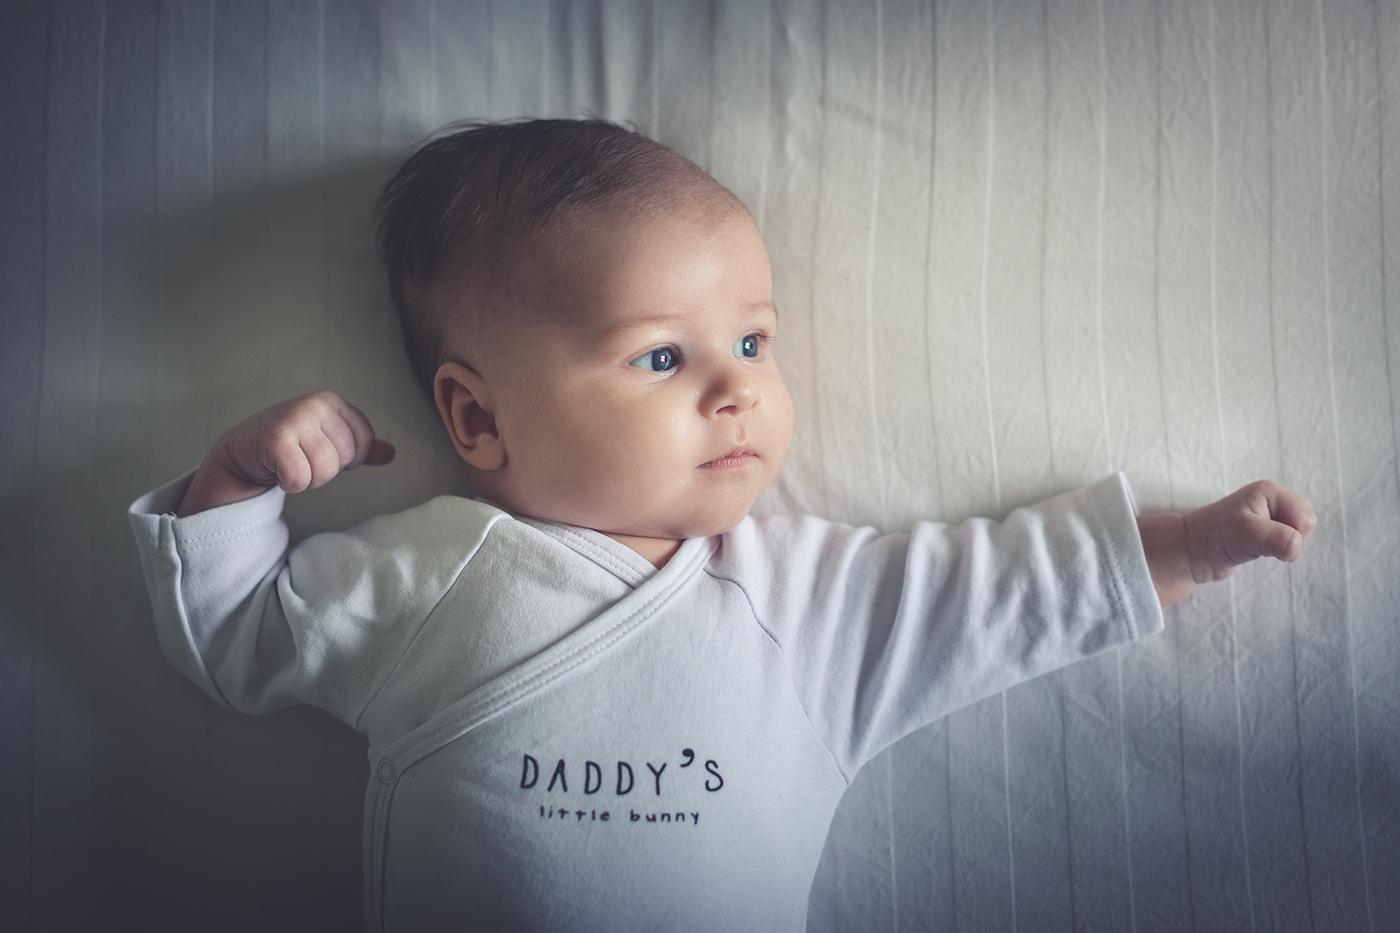 photographe-naissance-maternite-enfant-bebe-poitiers-guillaume-heraud-26